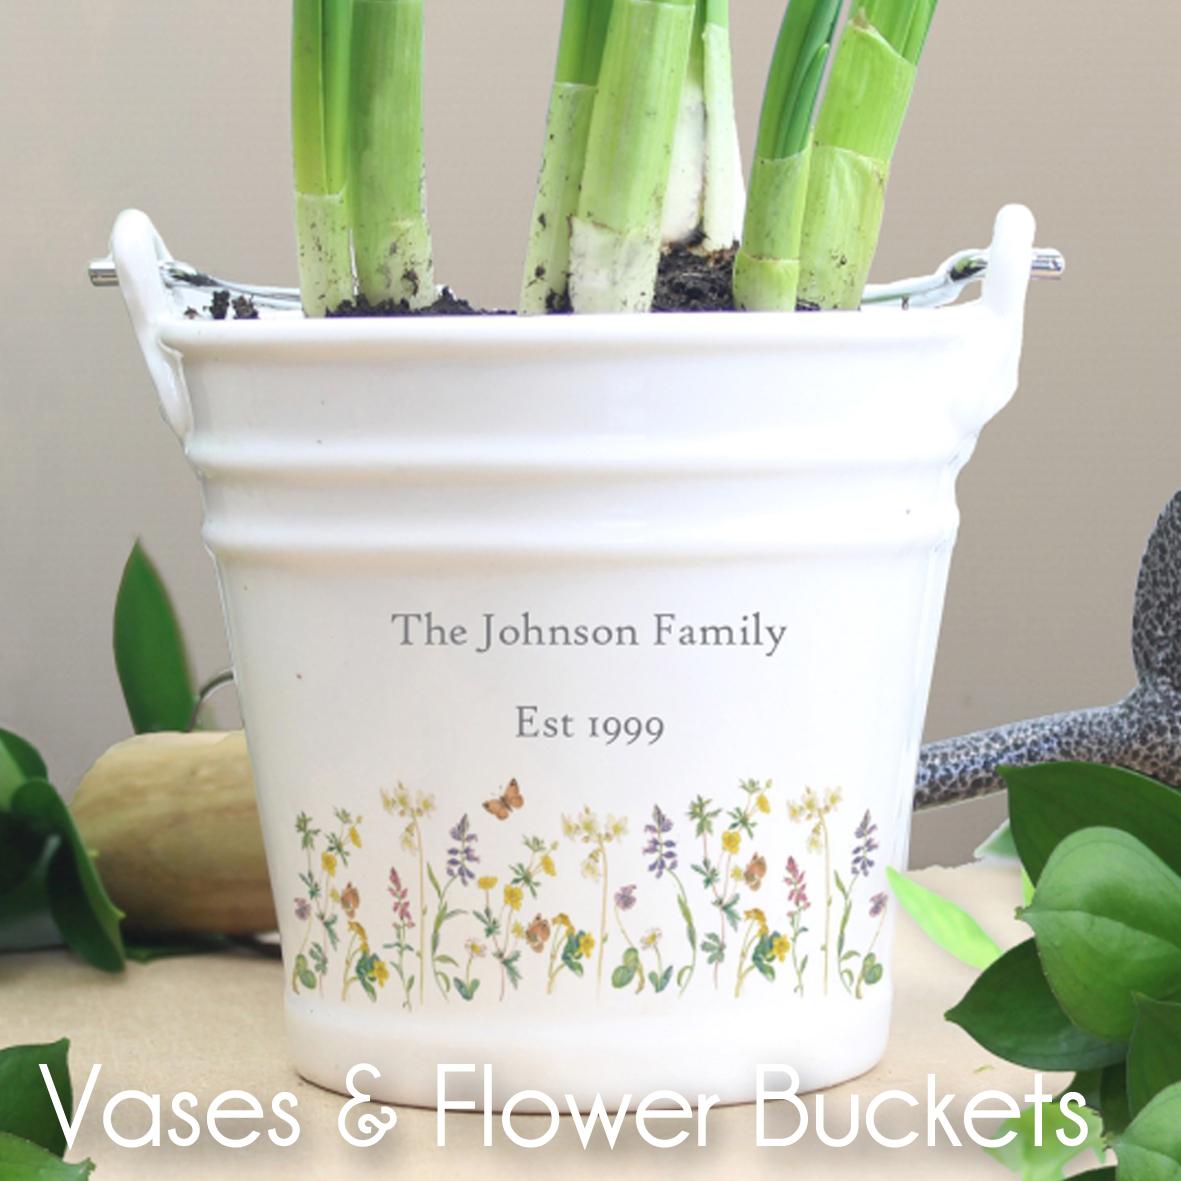 Vases & Flower Buckets